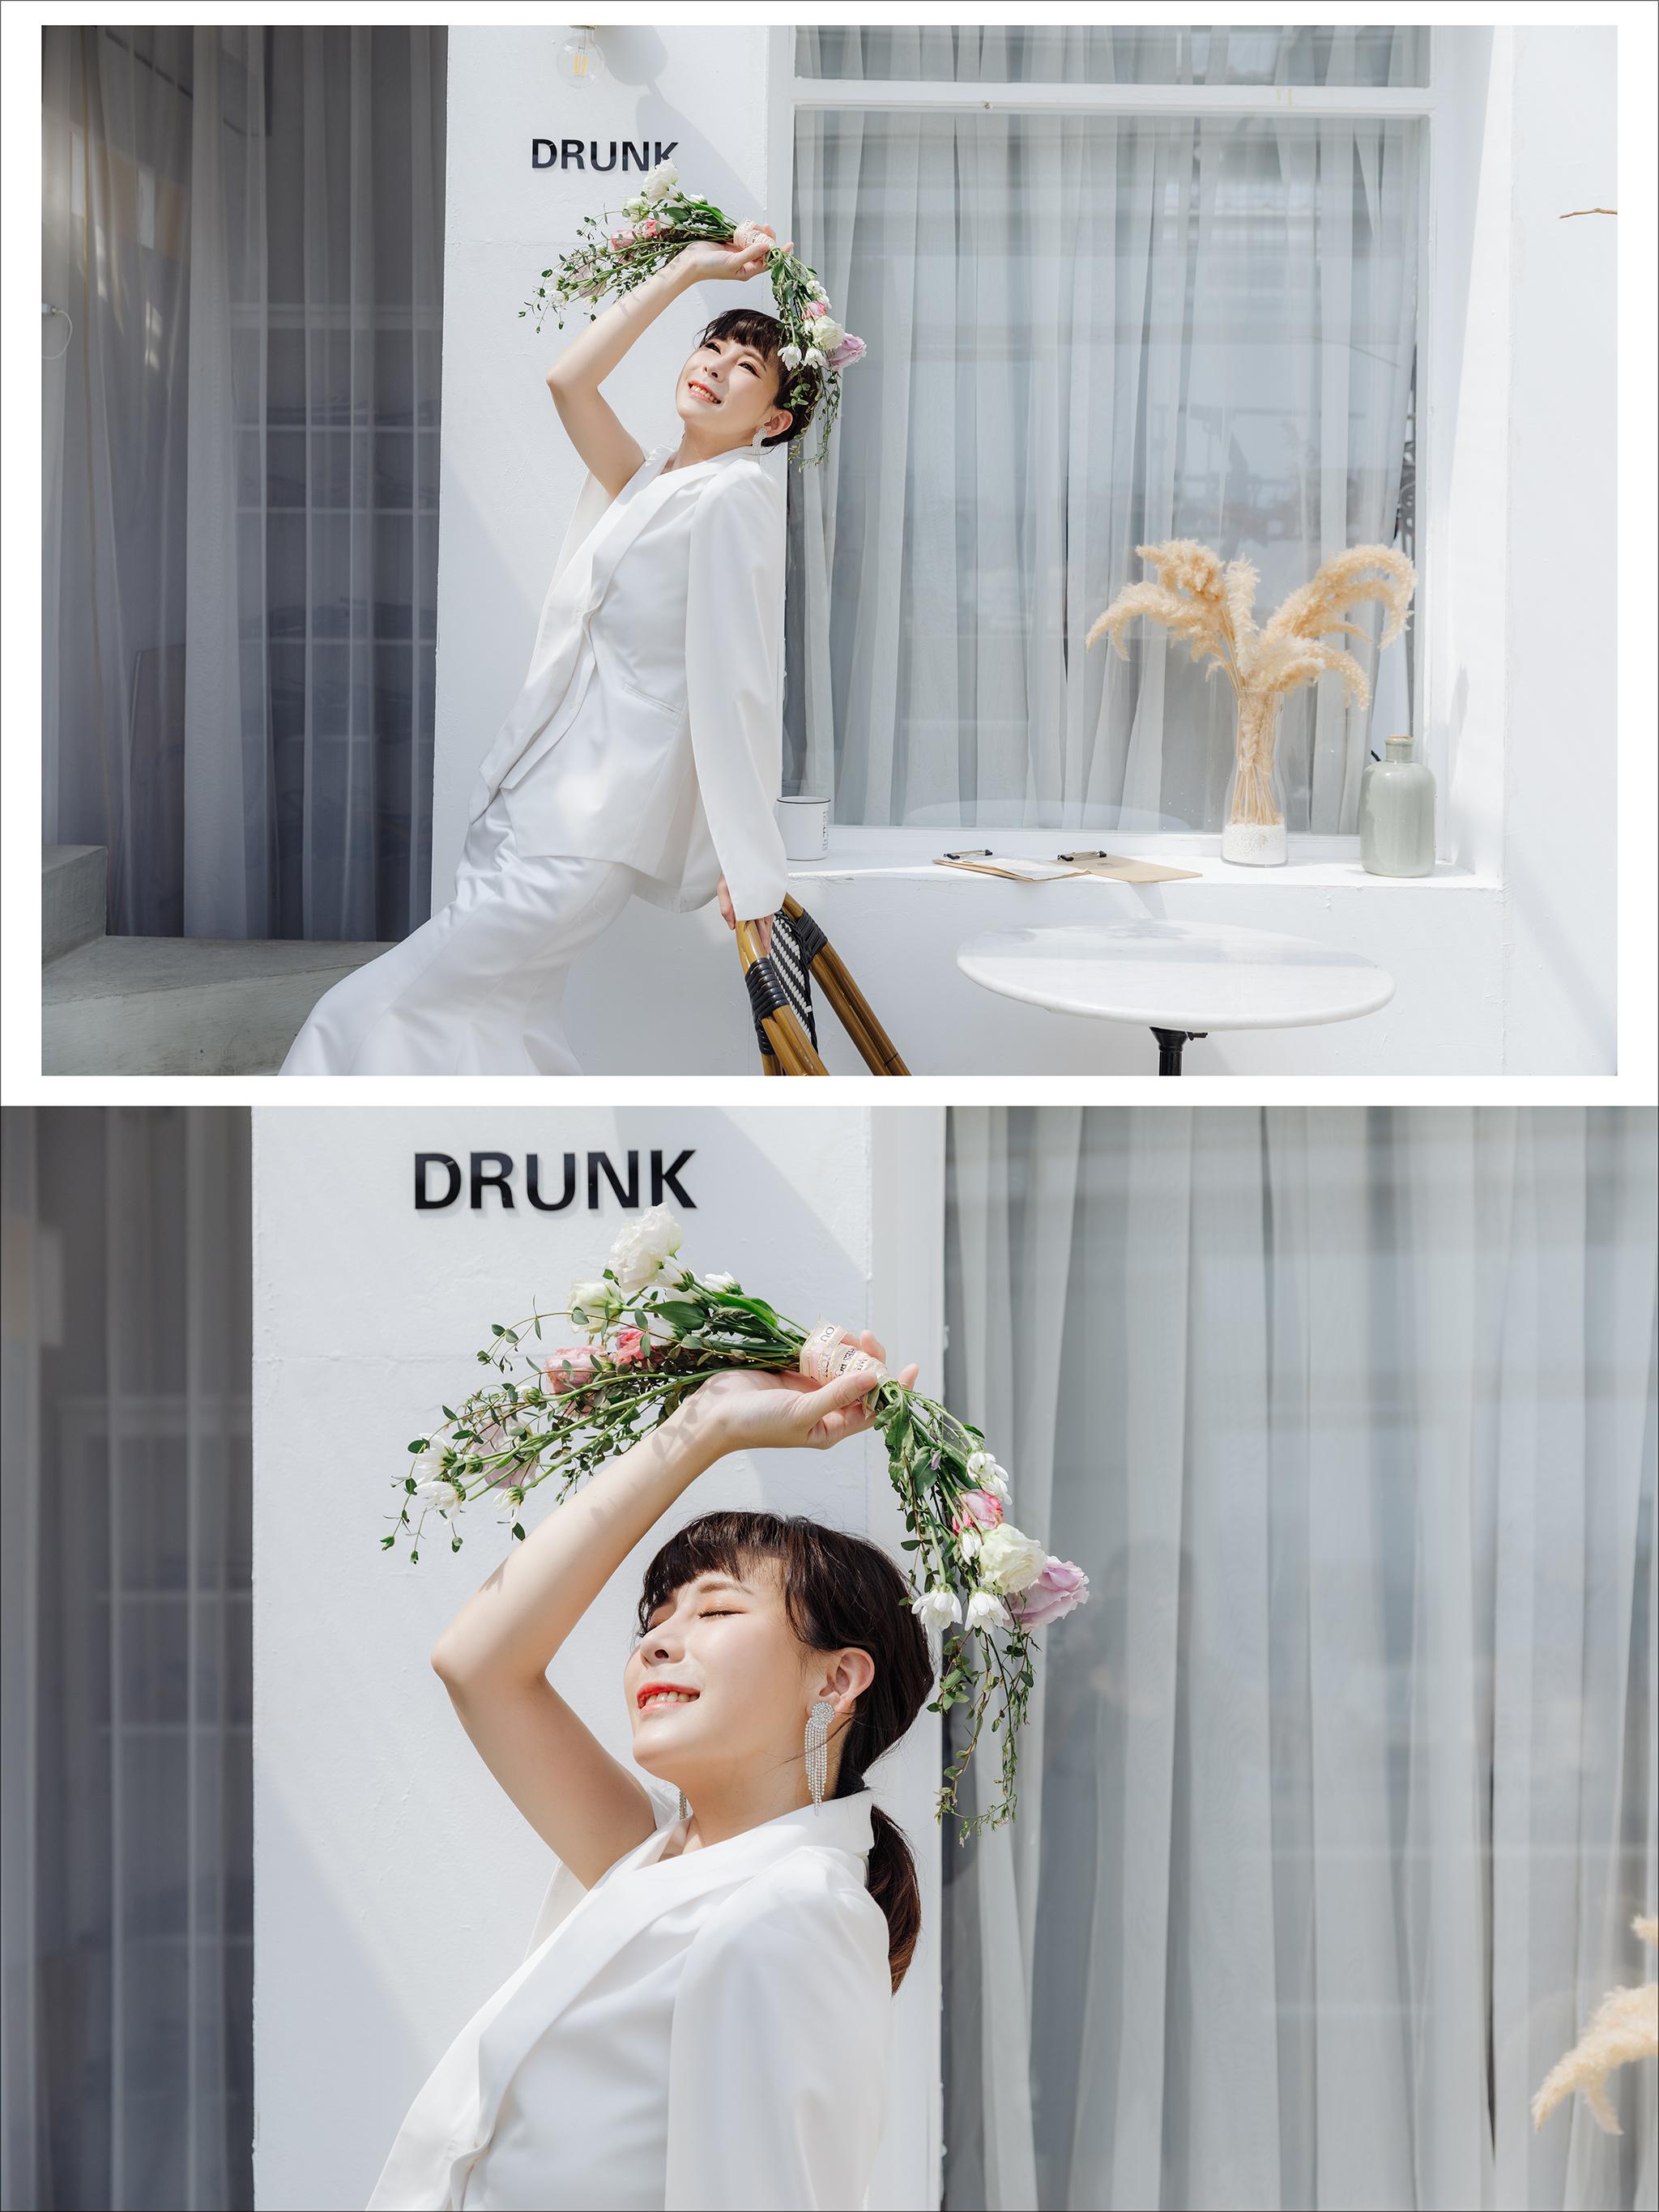 49883519167 c0c801ca73 o - 【自主婚紗】+潤潤+